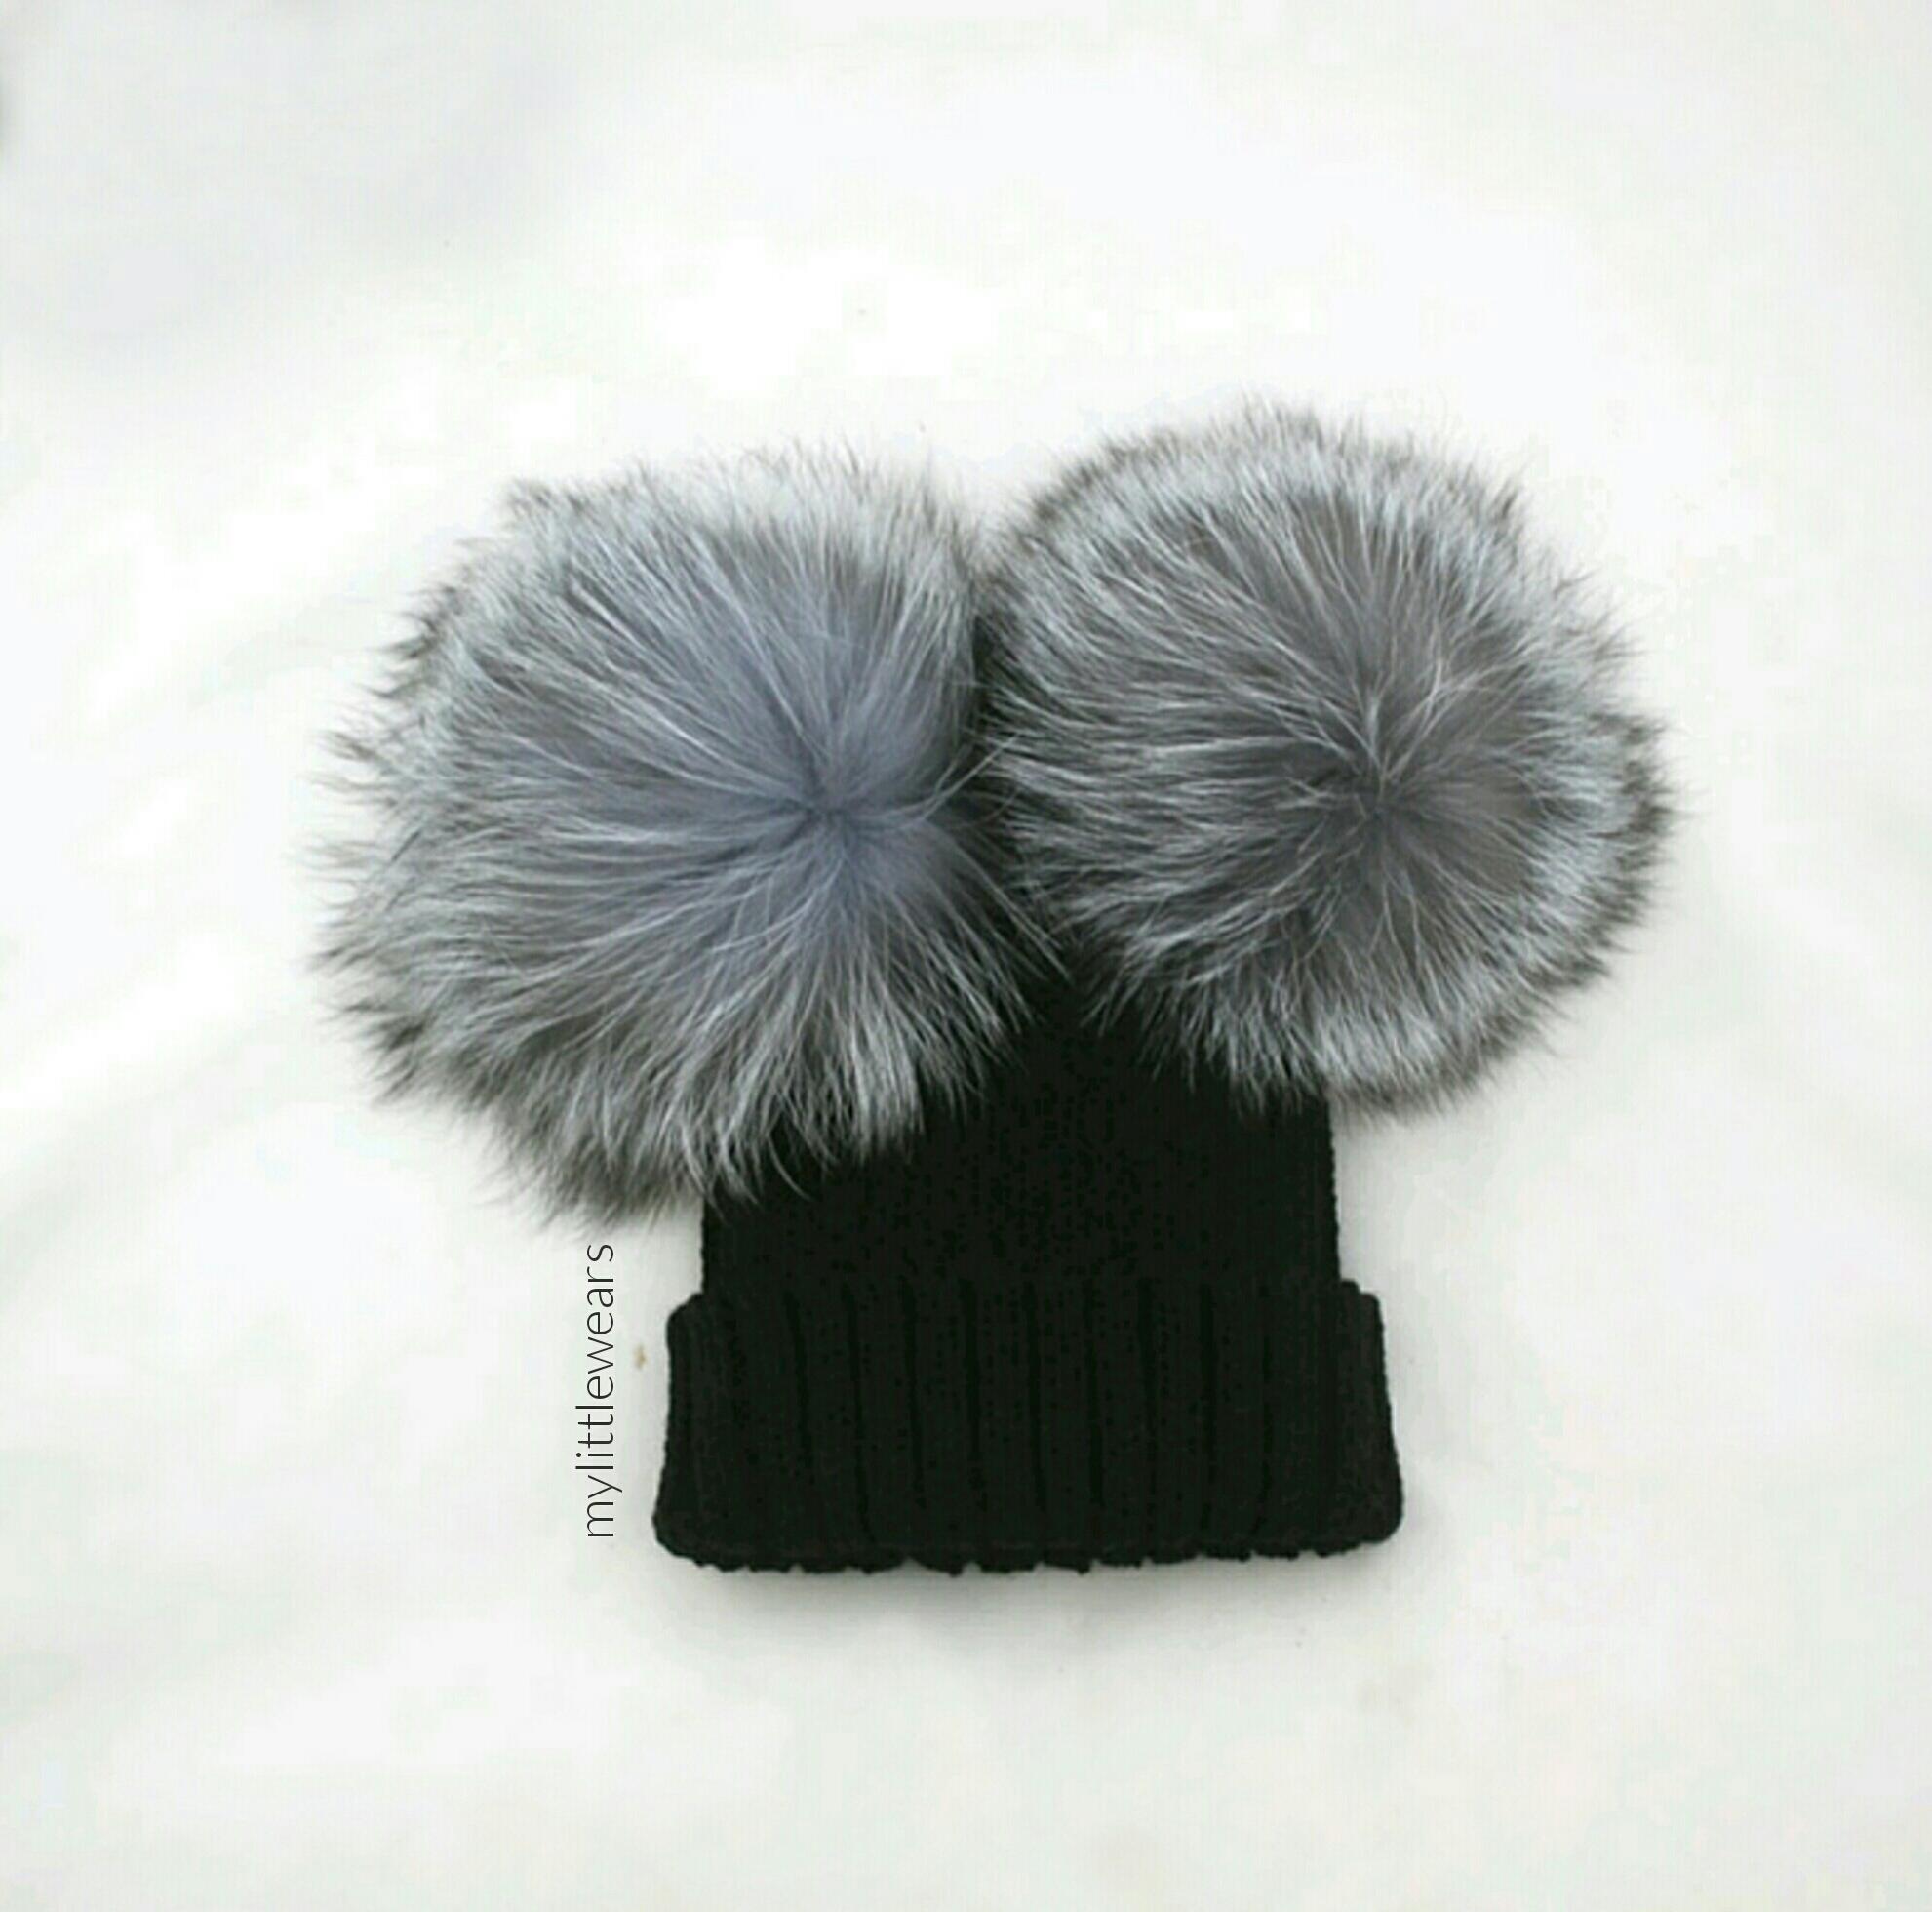 07452fc9e Minnie PomPom Hat - Black & Silver Grey